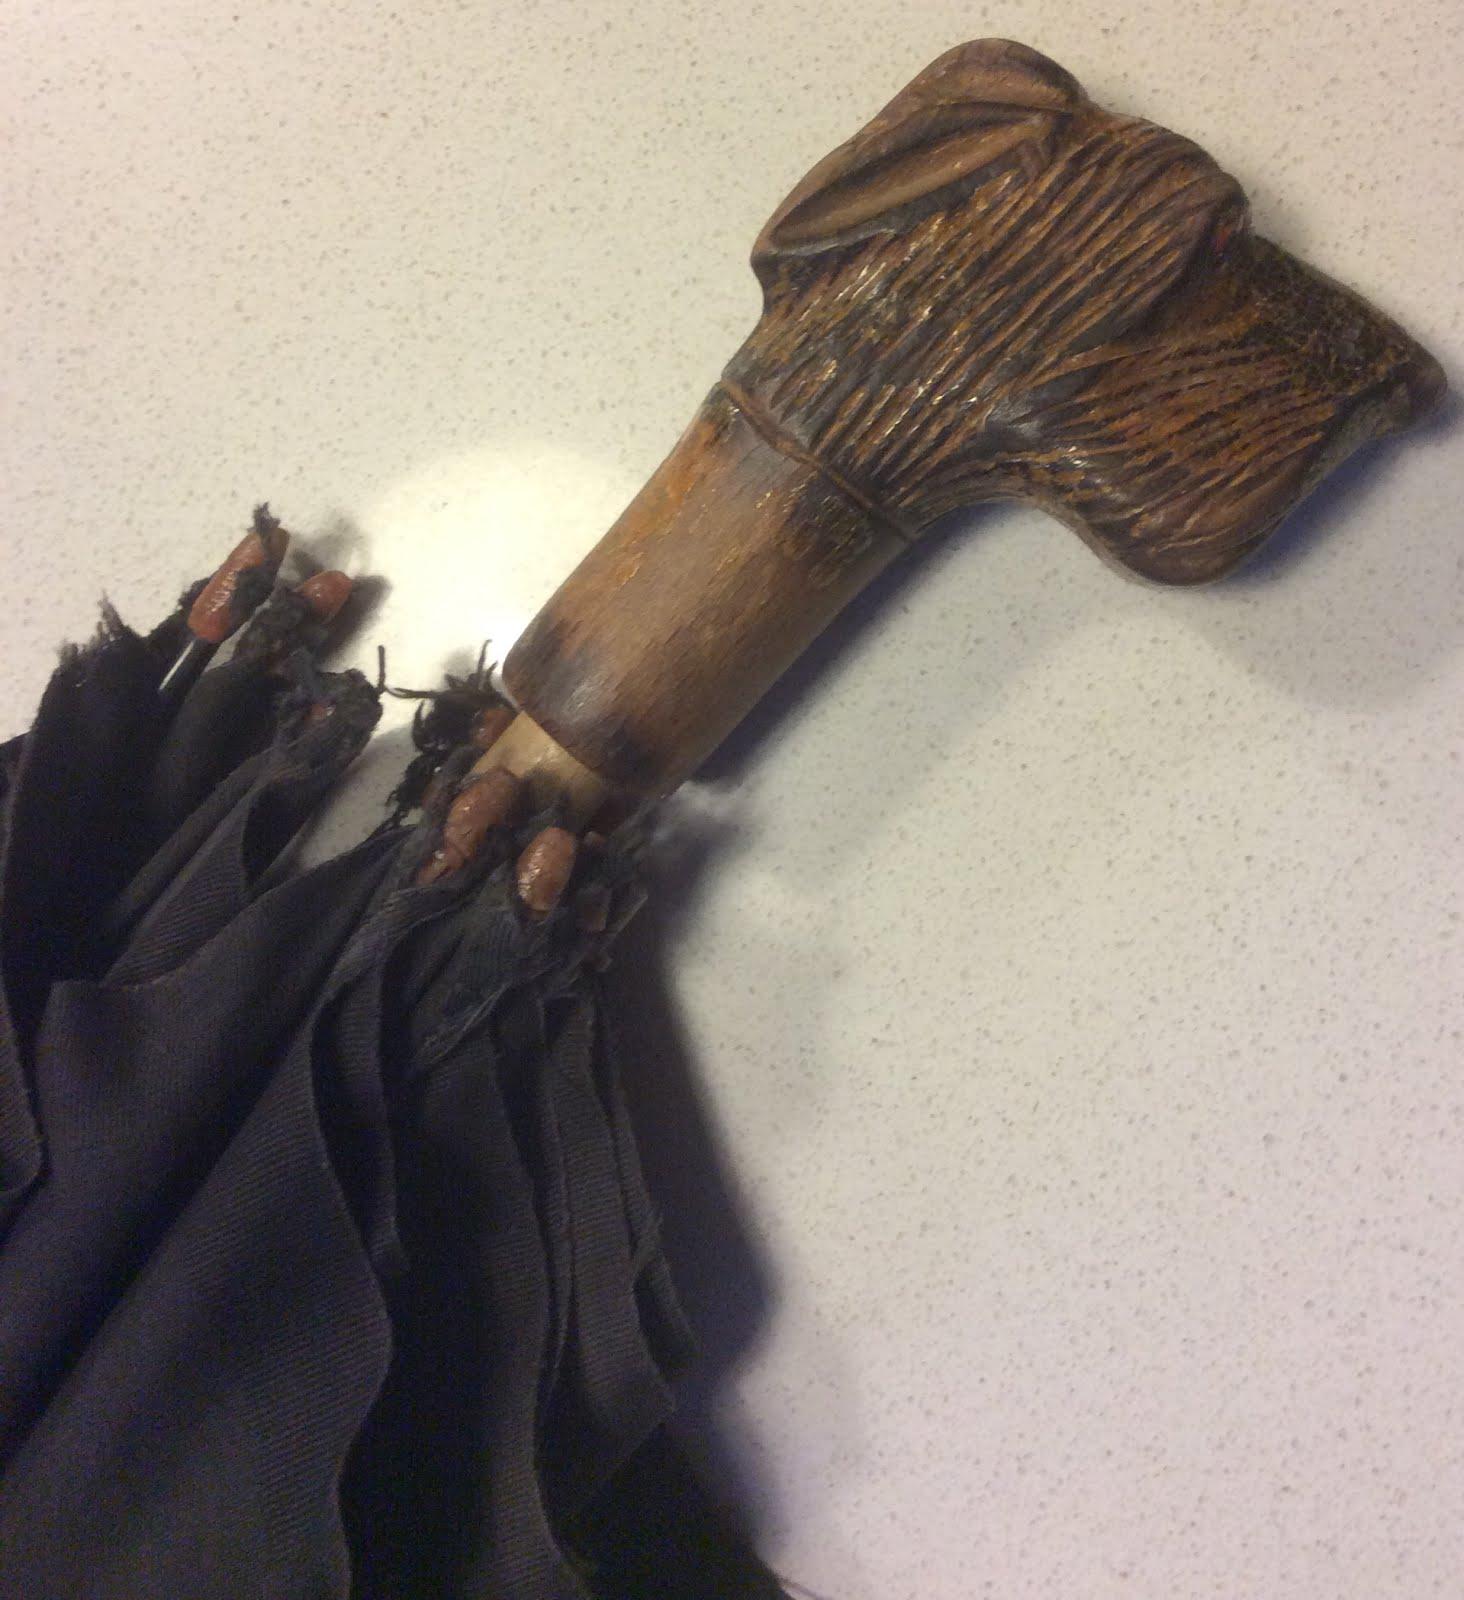 Restauraci n de antig edades restauraci n de antiguo paraguas - Tela de paraguas ...